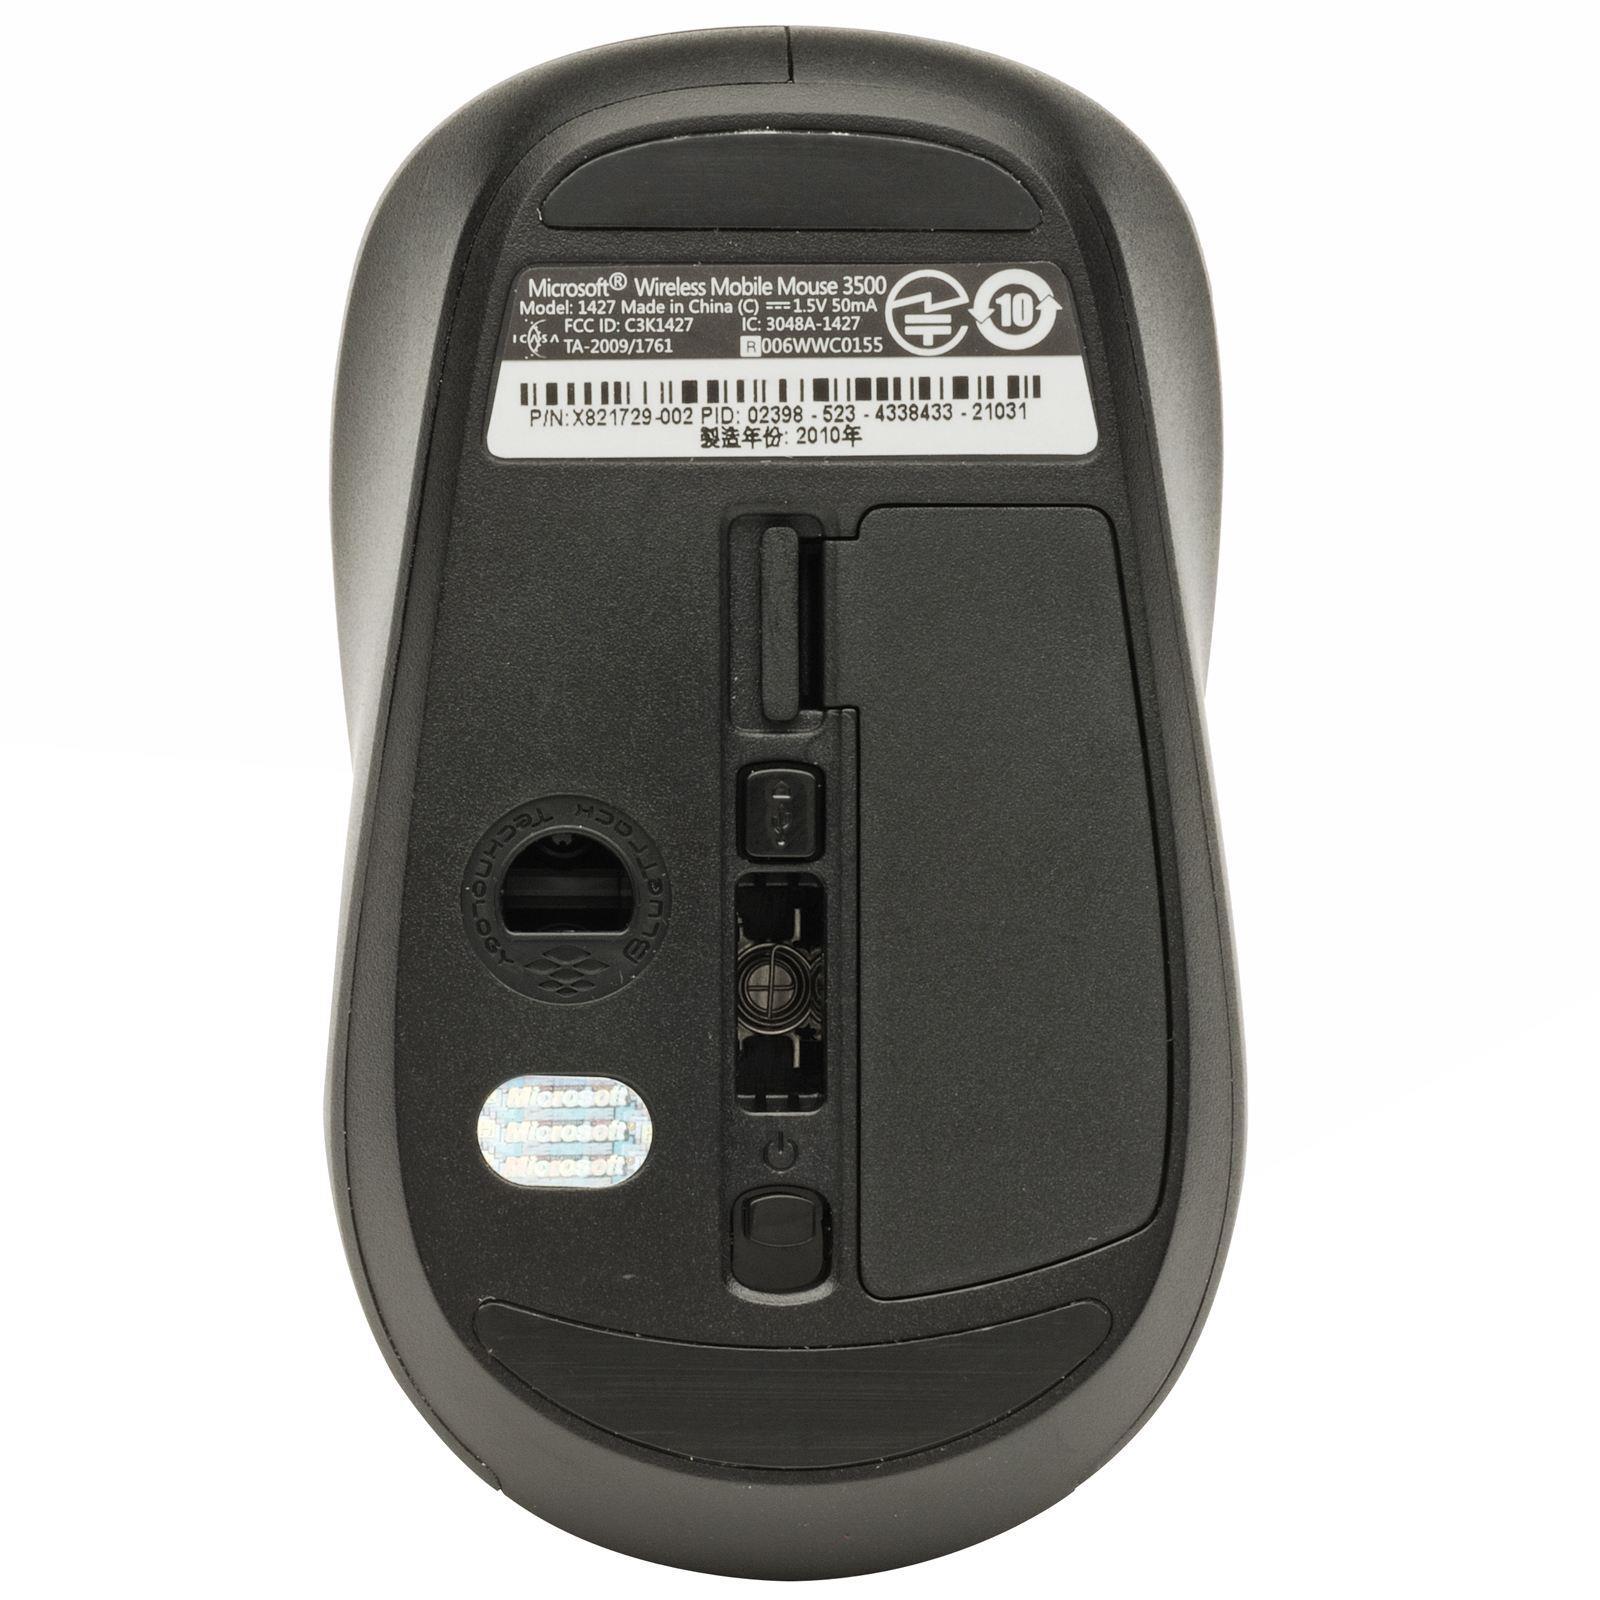 microsoft wireless mouse 3500 model 1427 driver